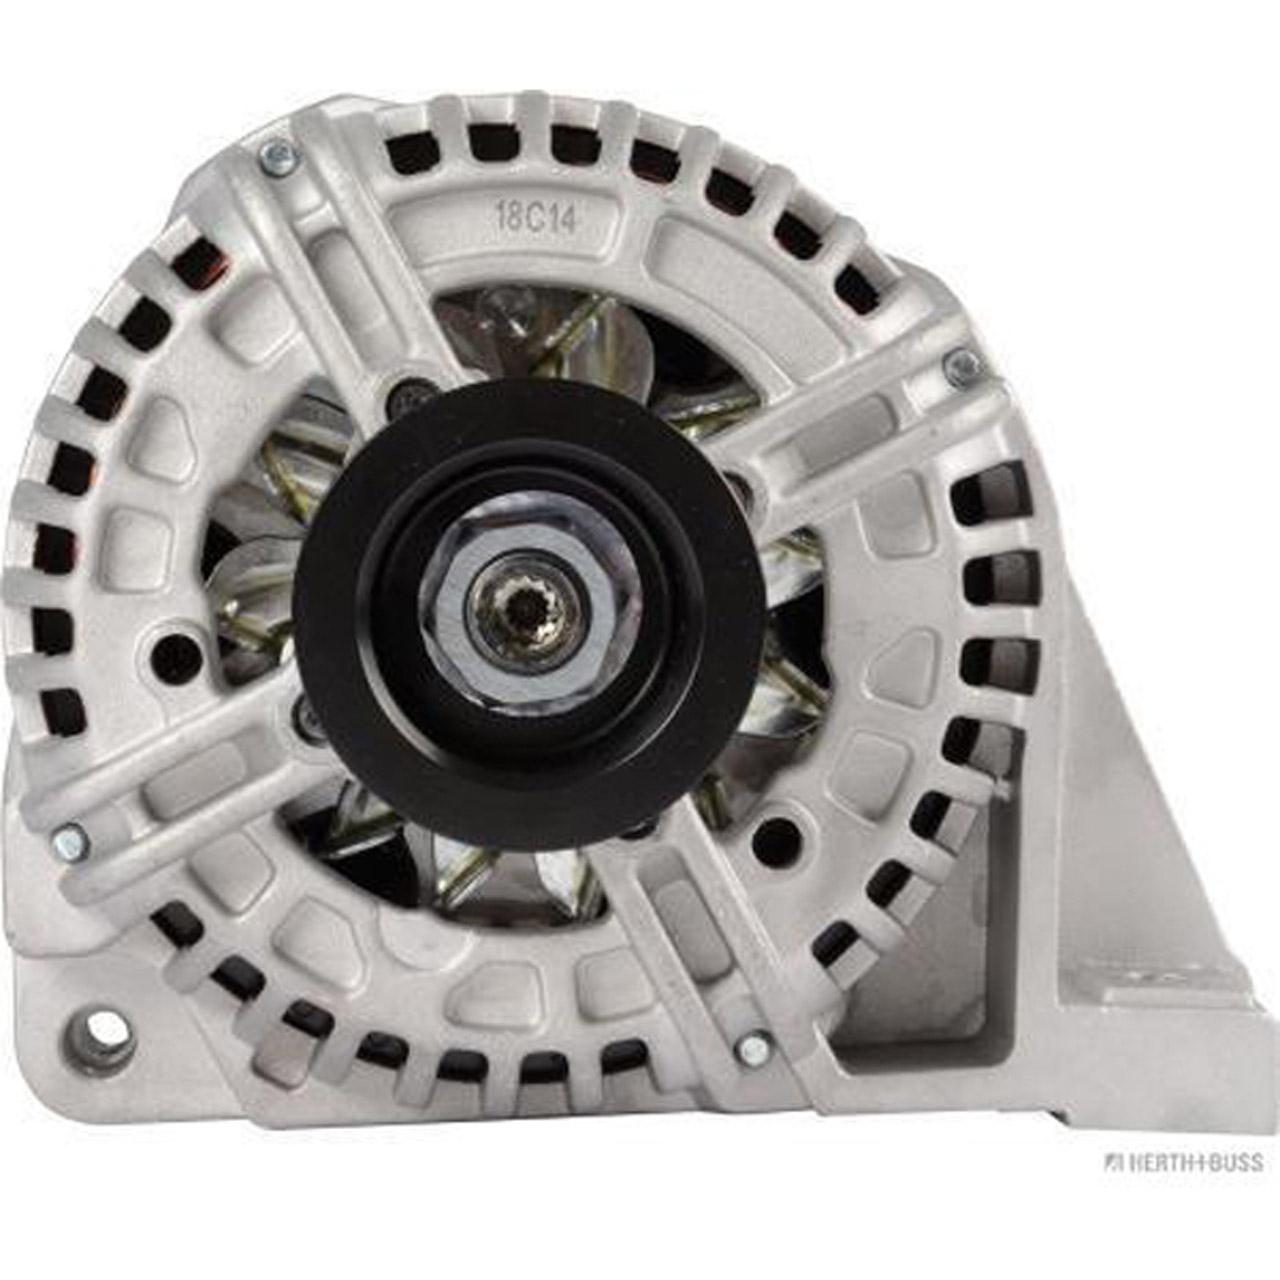 HERTH+BUSS Lichtmaschine 14V 120A VOLVO S60 I S80 I V70 II XC70 Cross 2.0-2.5